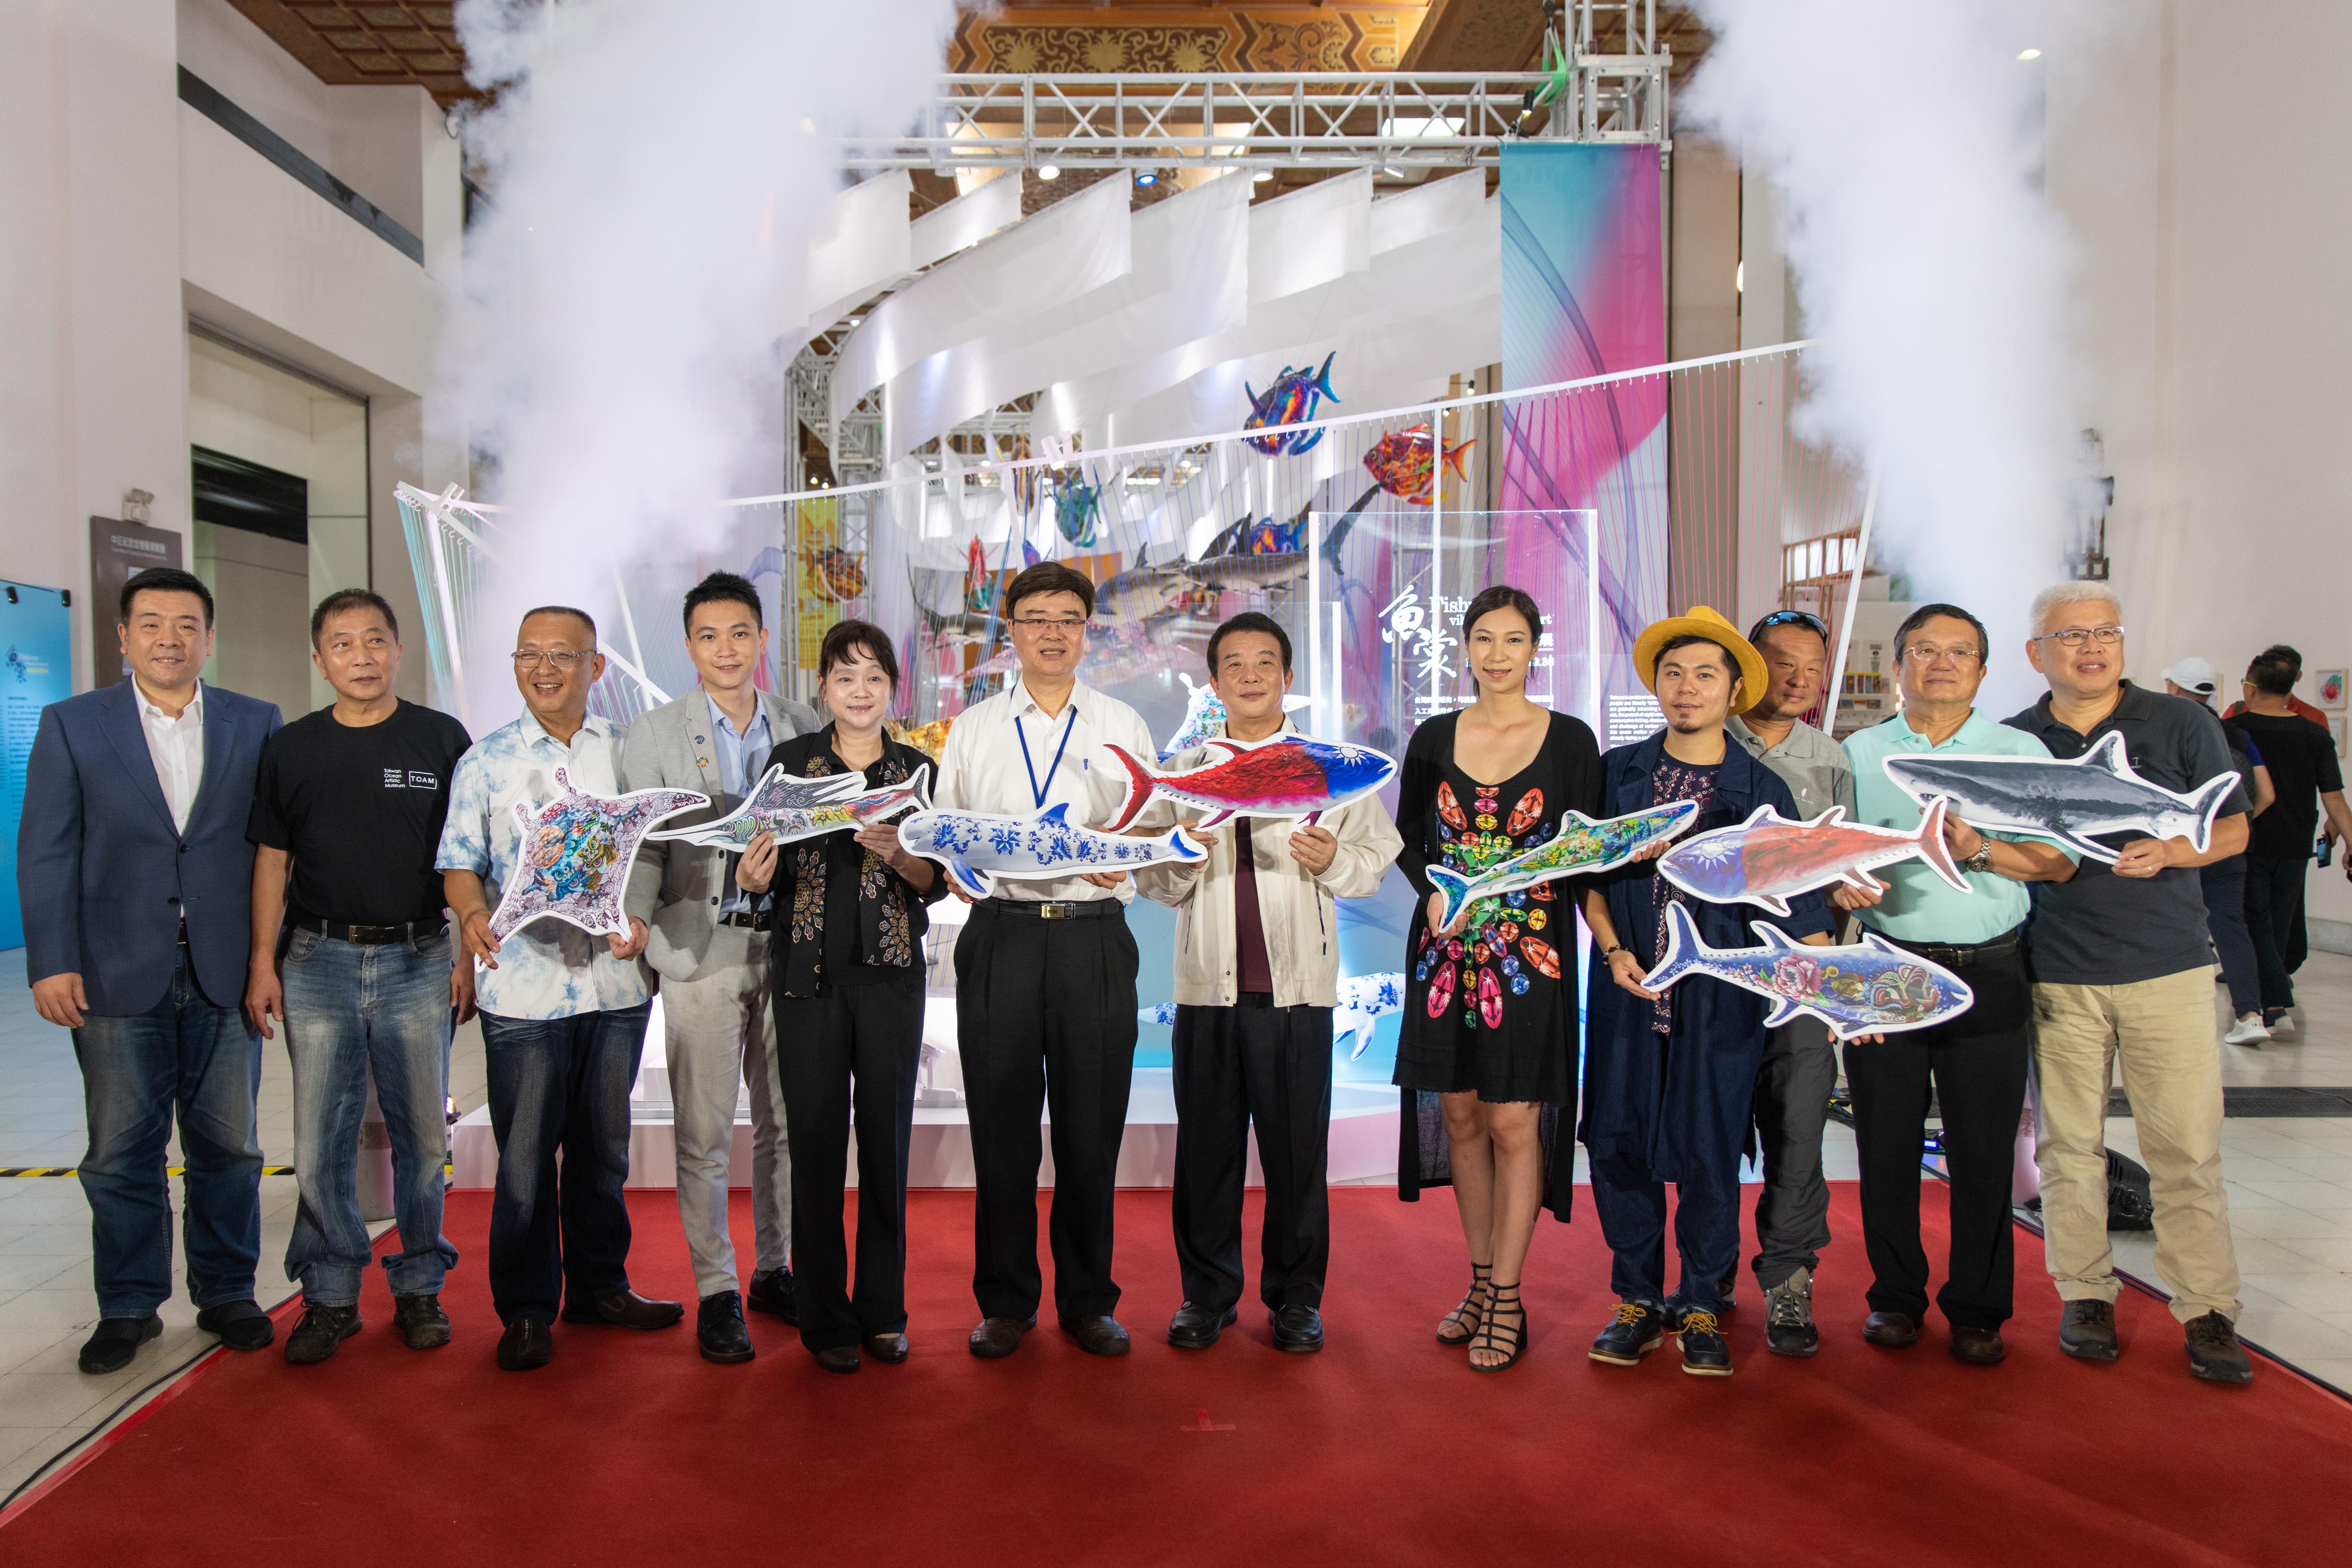 20190628-20191030 Fishwear- Vibrant Ocean Art opening